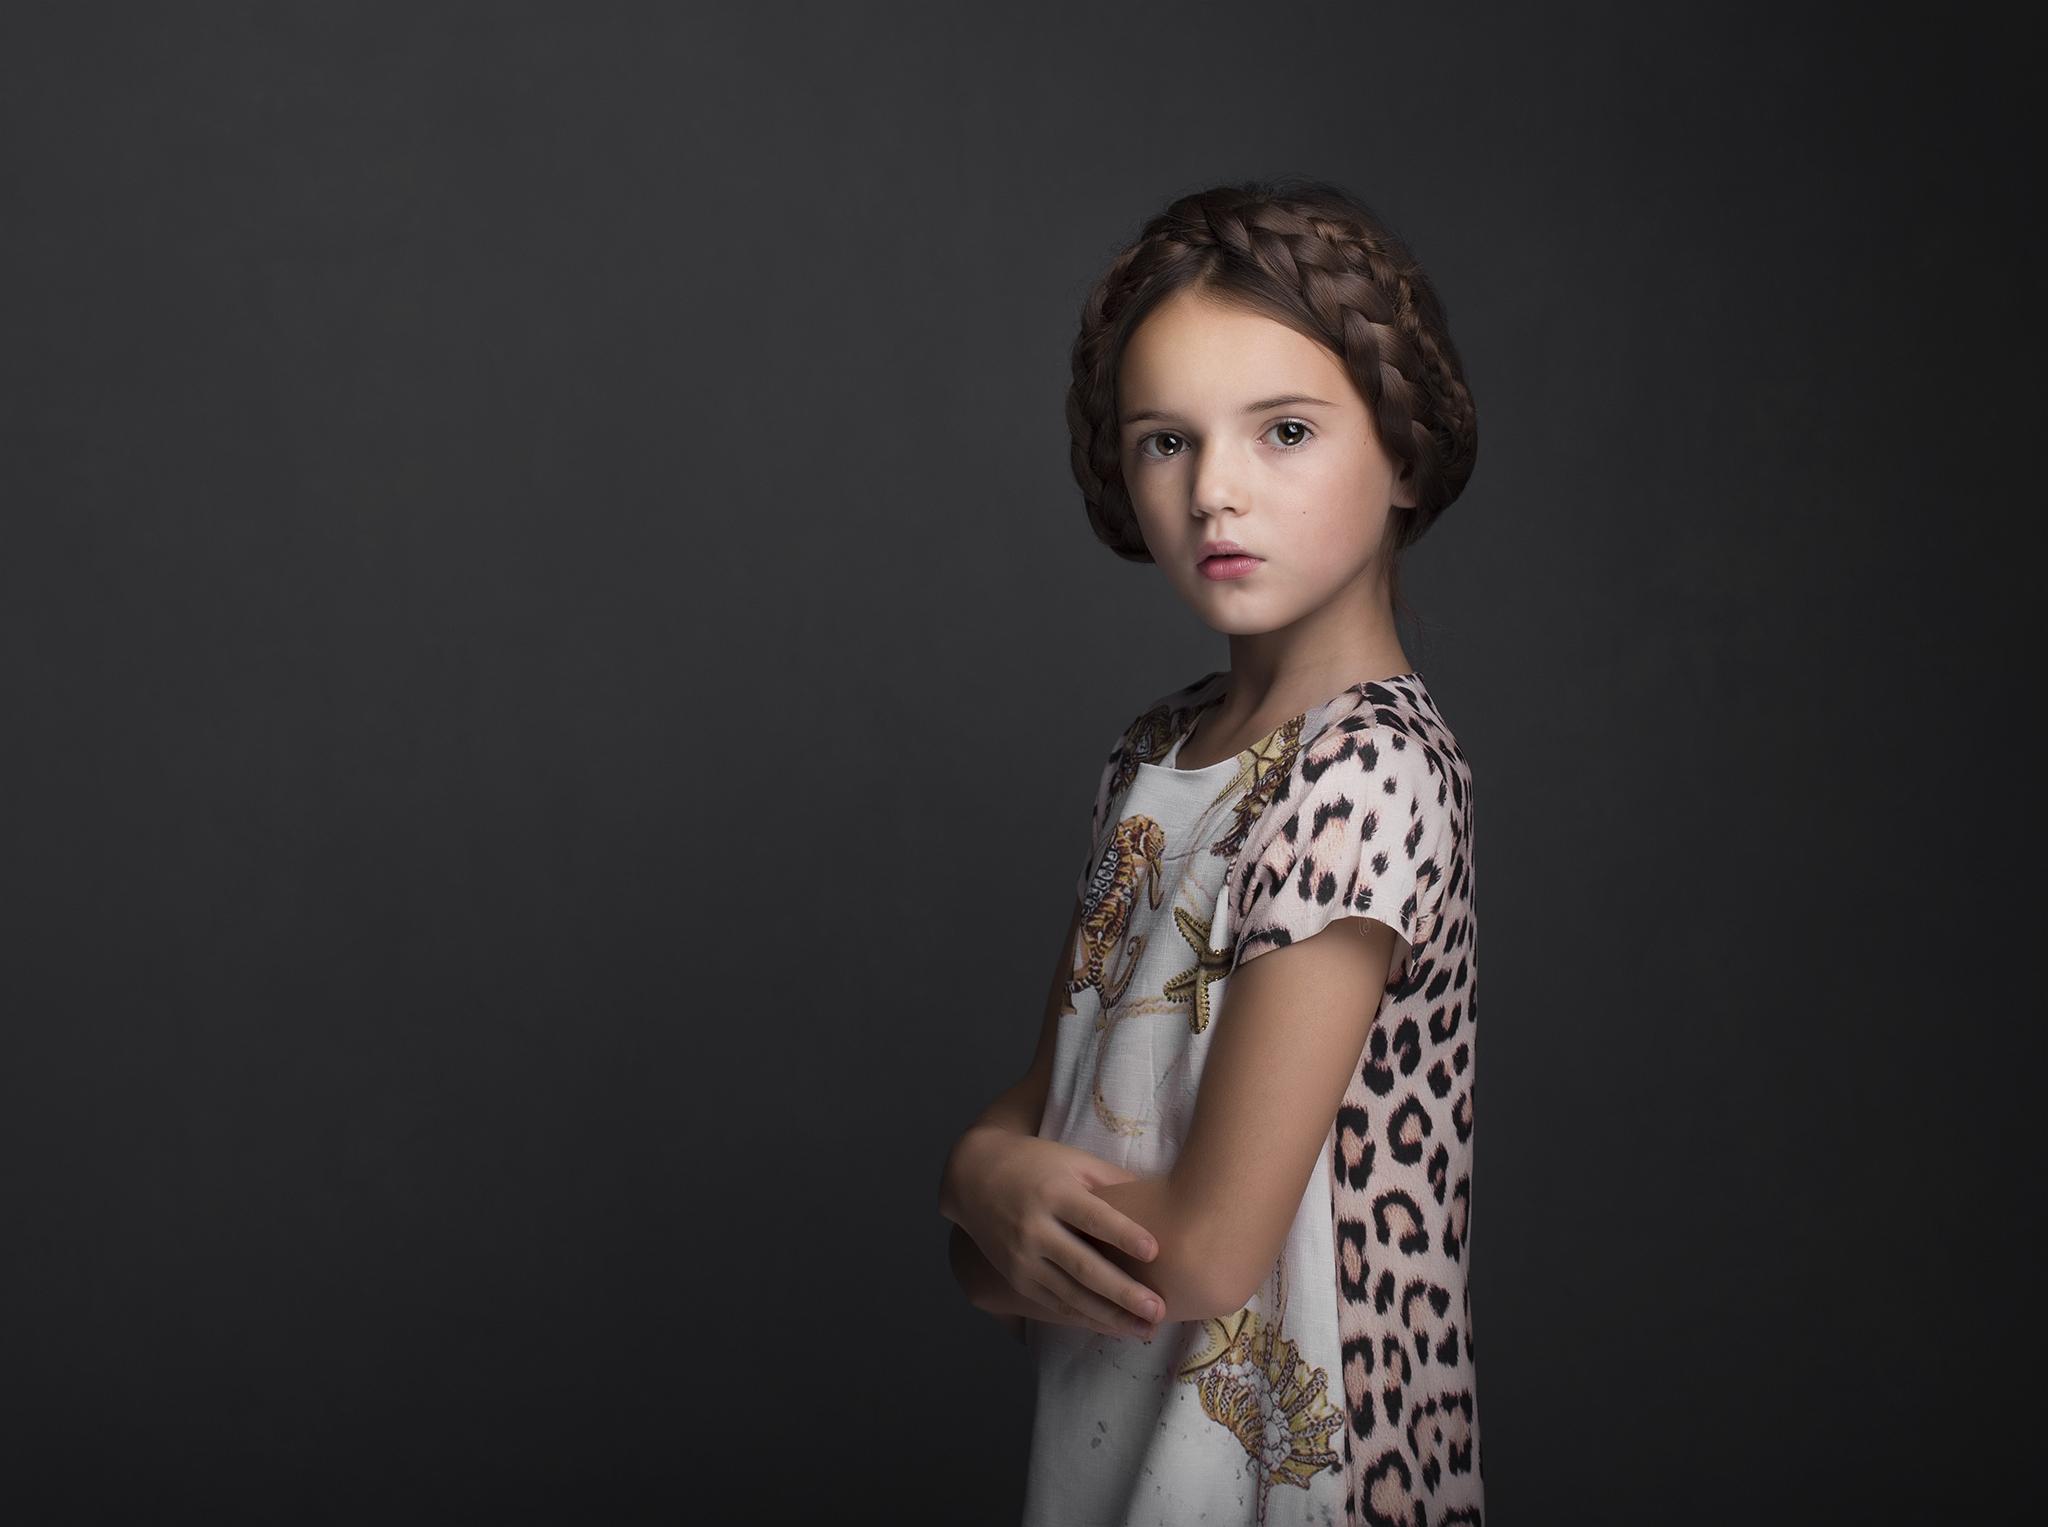 elizabethgfineartphotography_kingslangley_model_ava_1.jpg